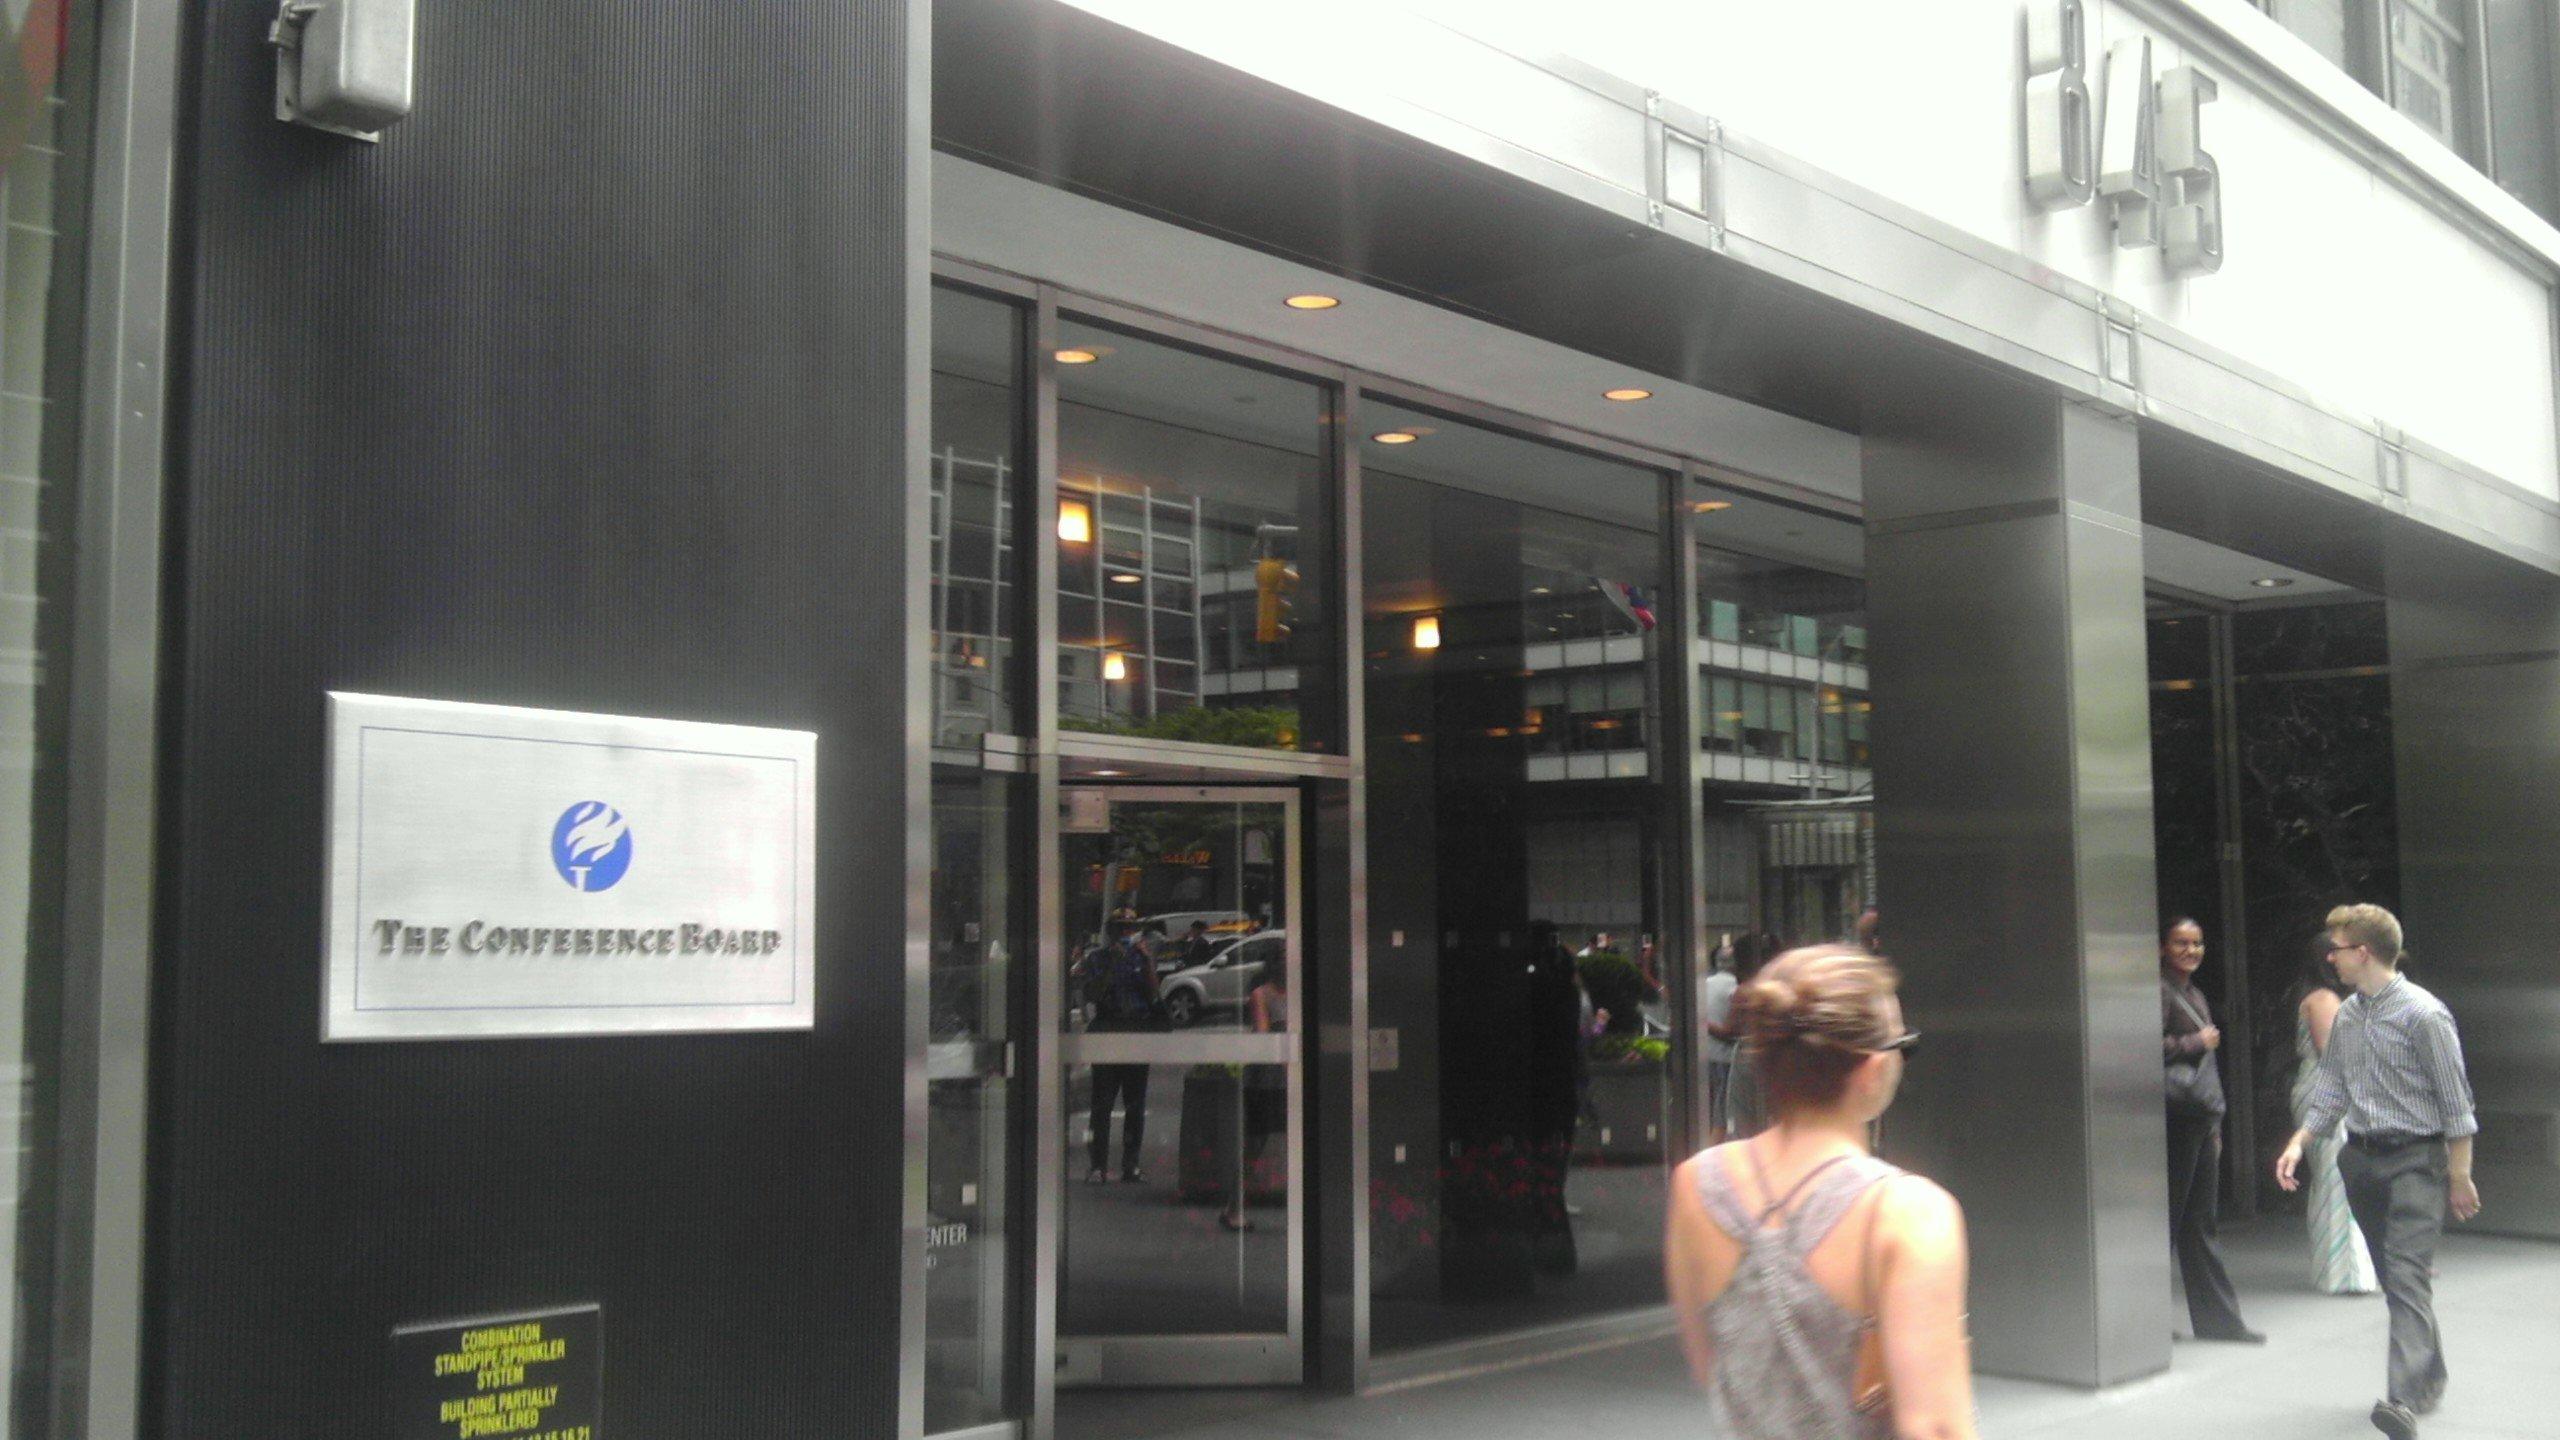 845 Third Avenue, Manhattan